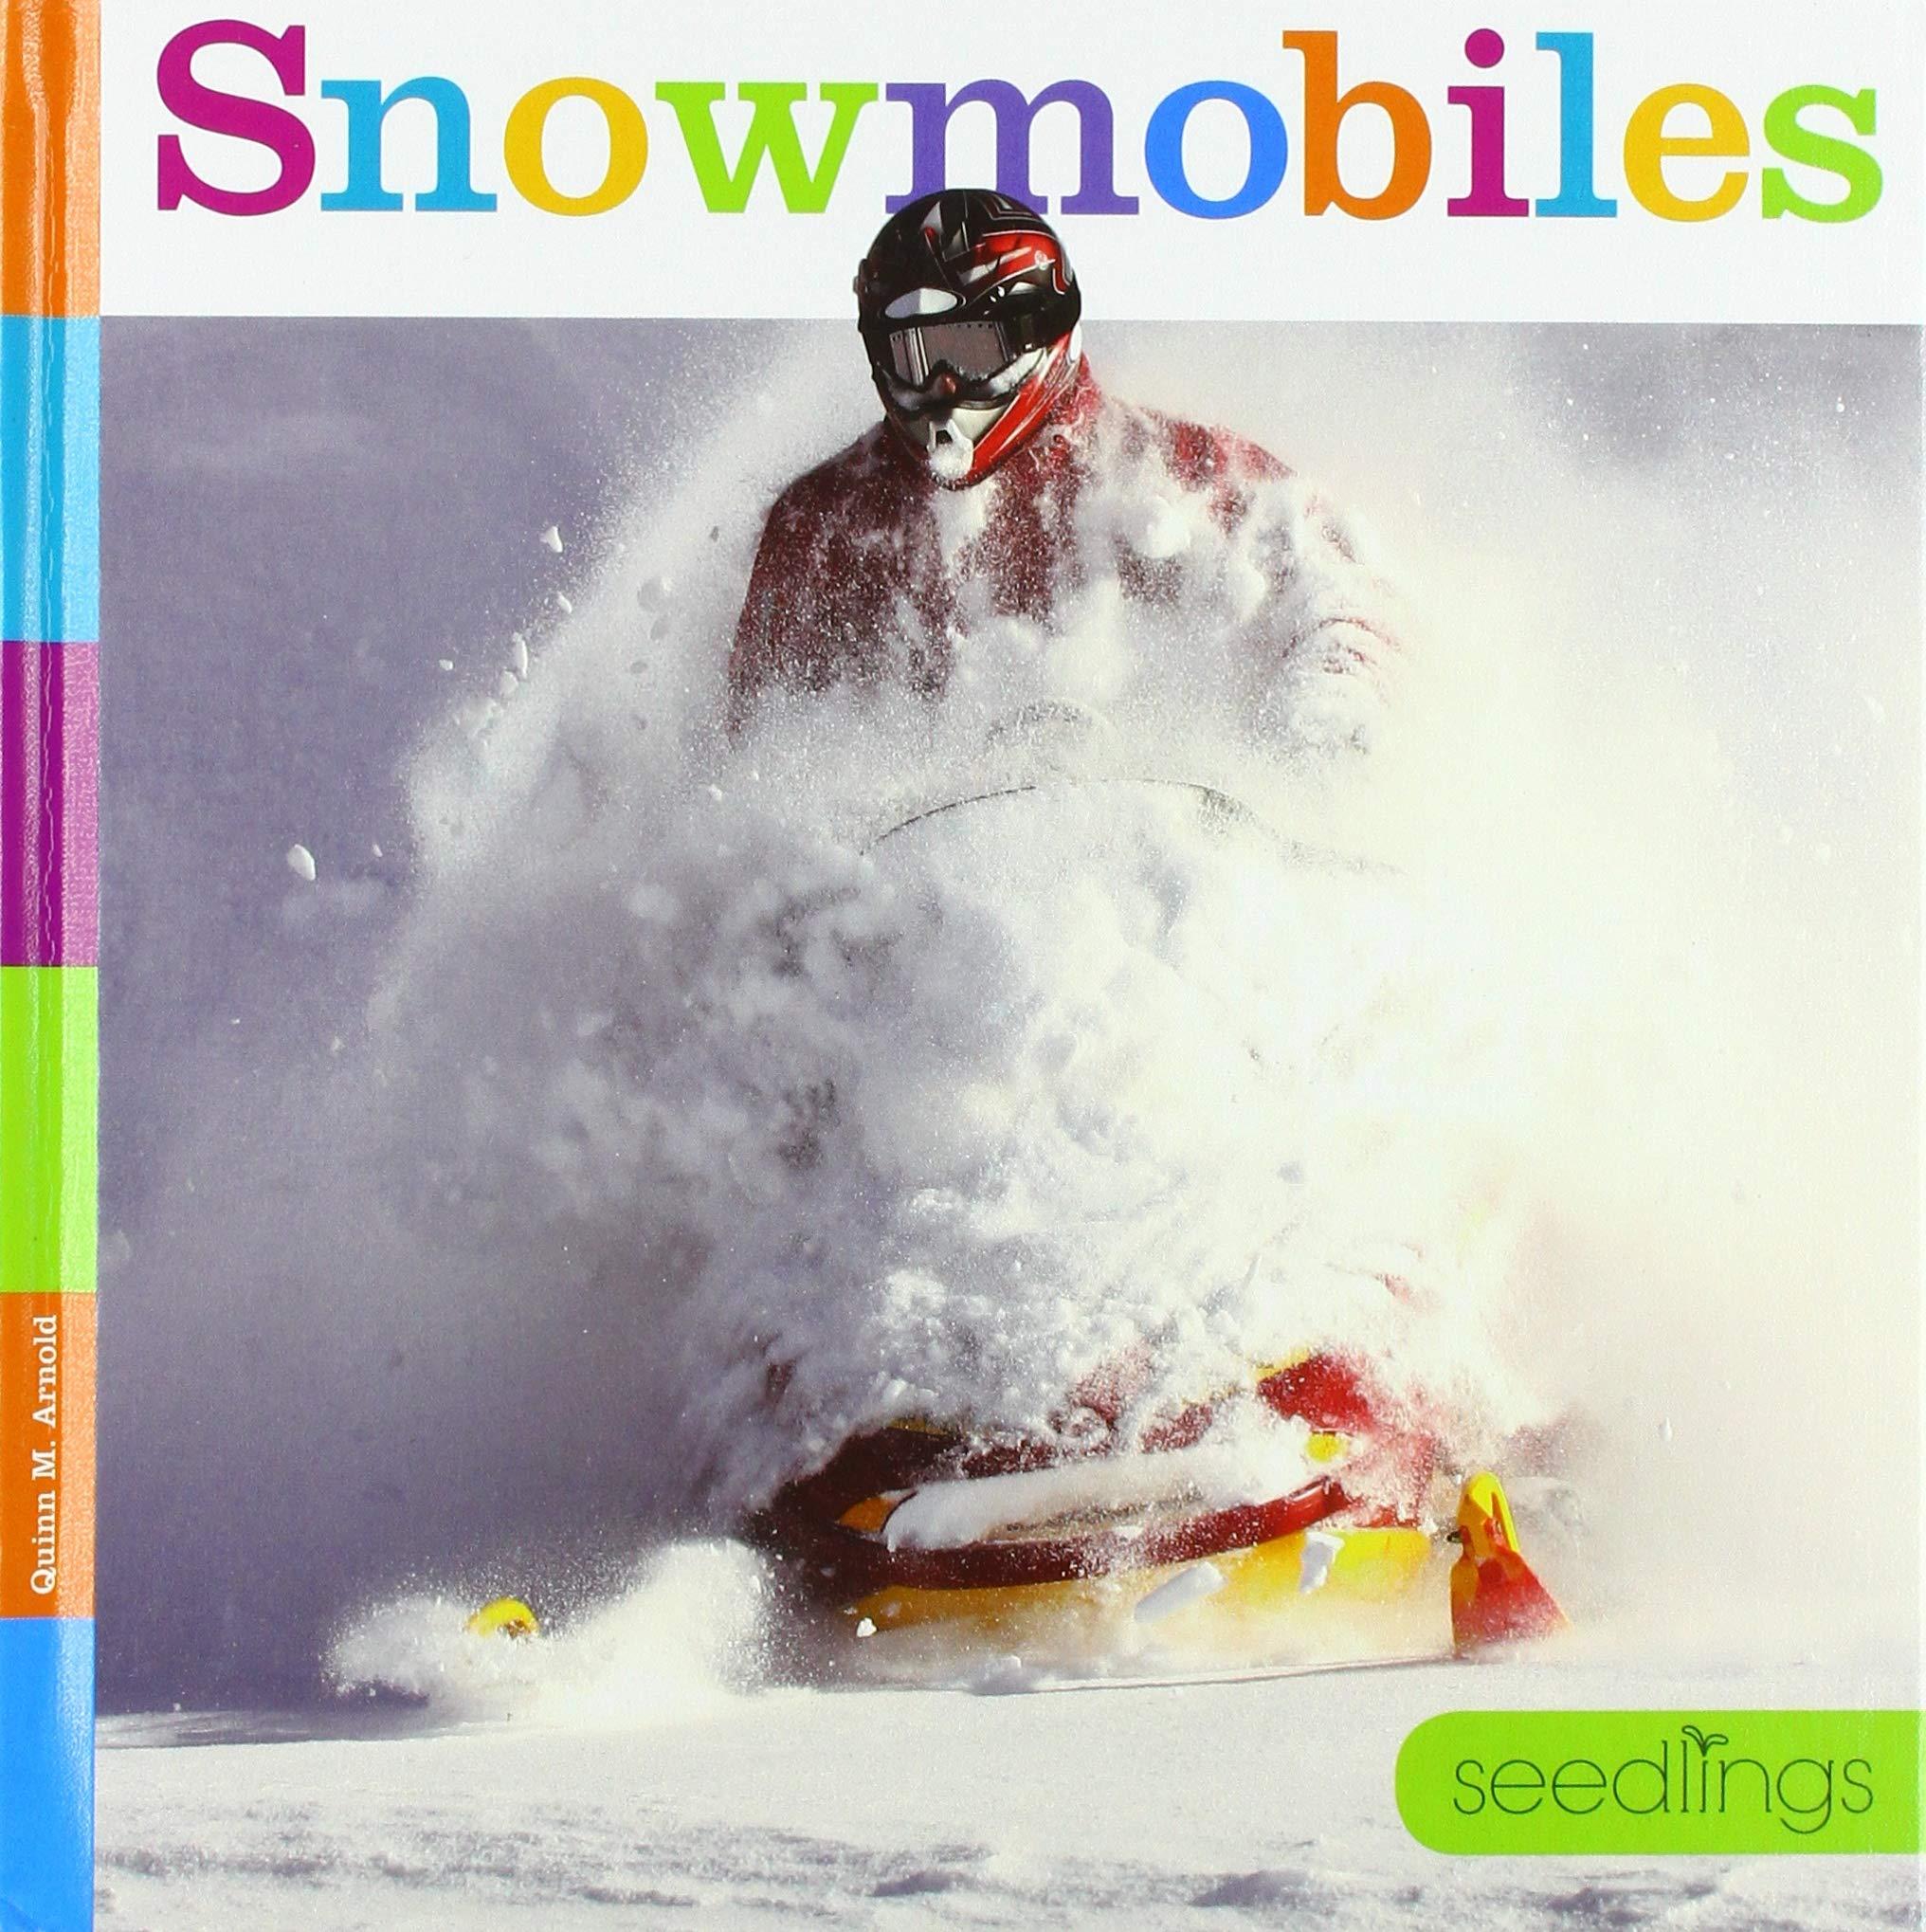 Amazon.com: Snowmobiles (Seedlings: On the Go) (9781640261730): Arnold,  Quinn M: Books